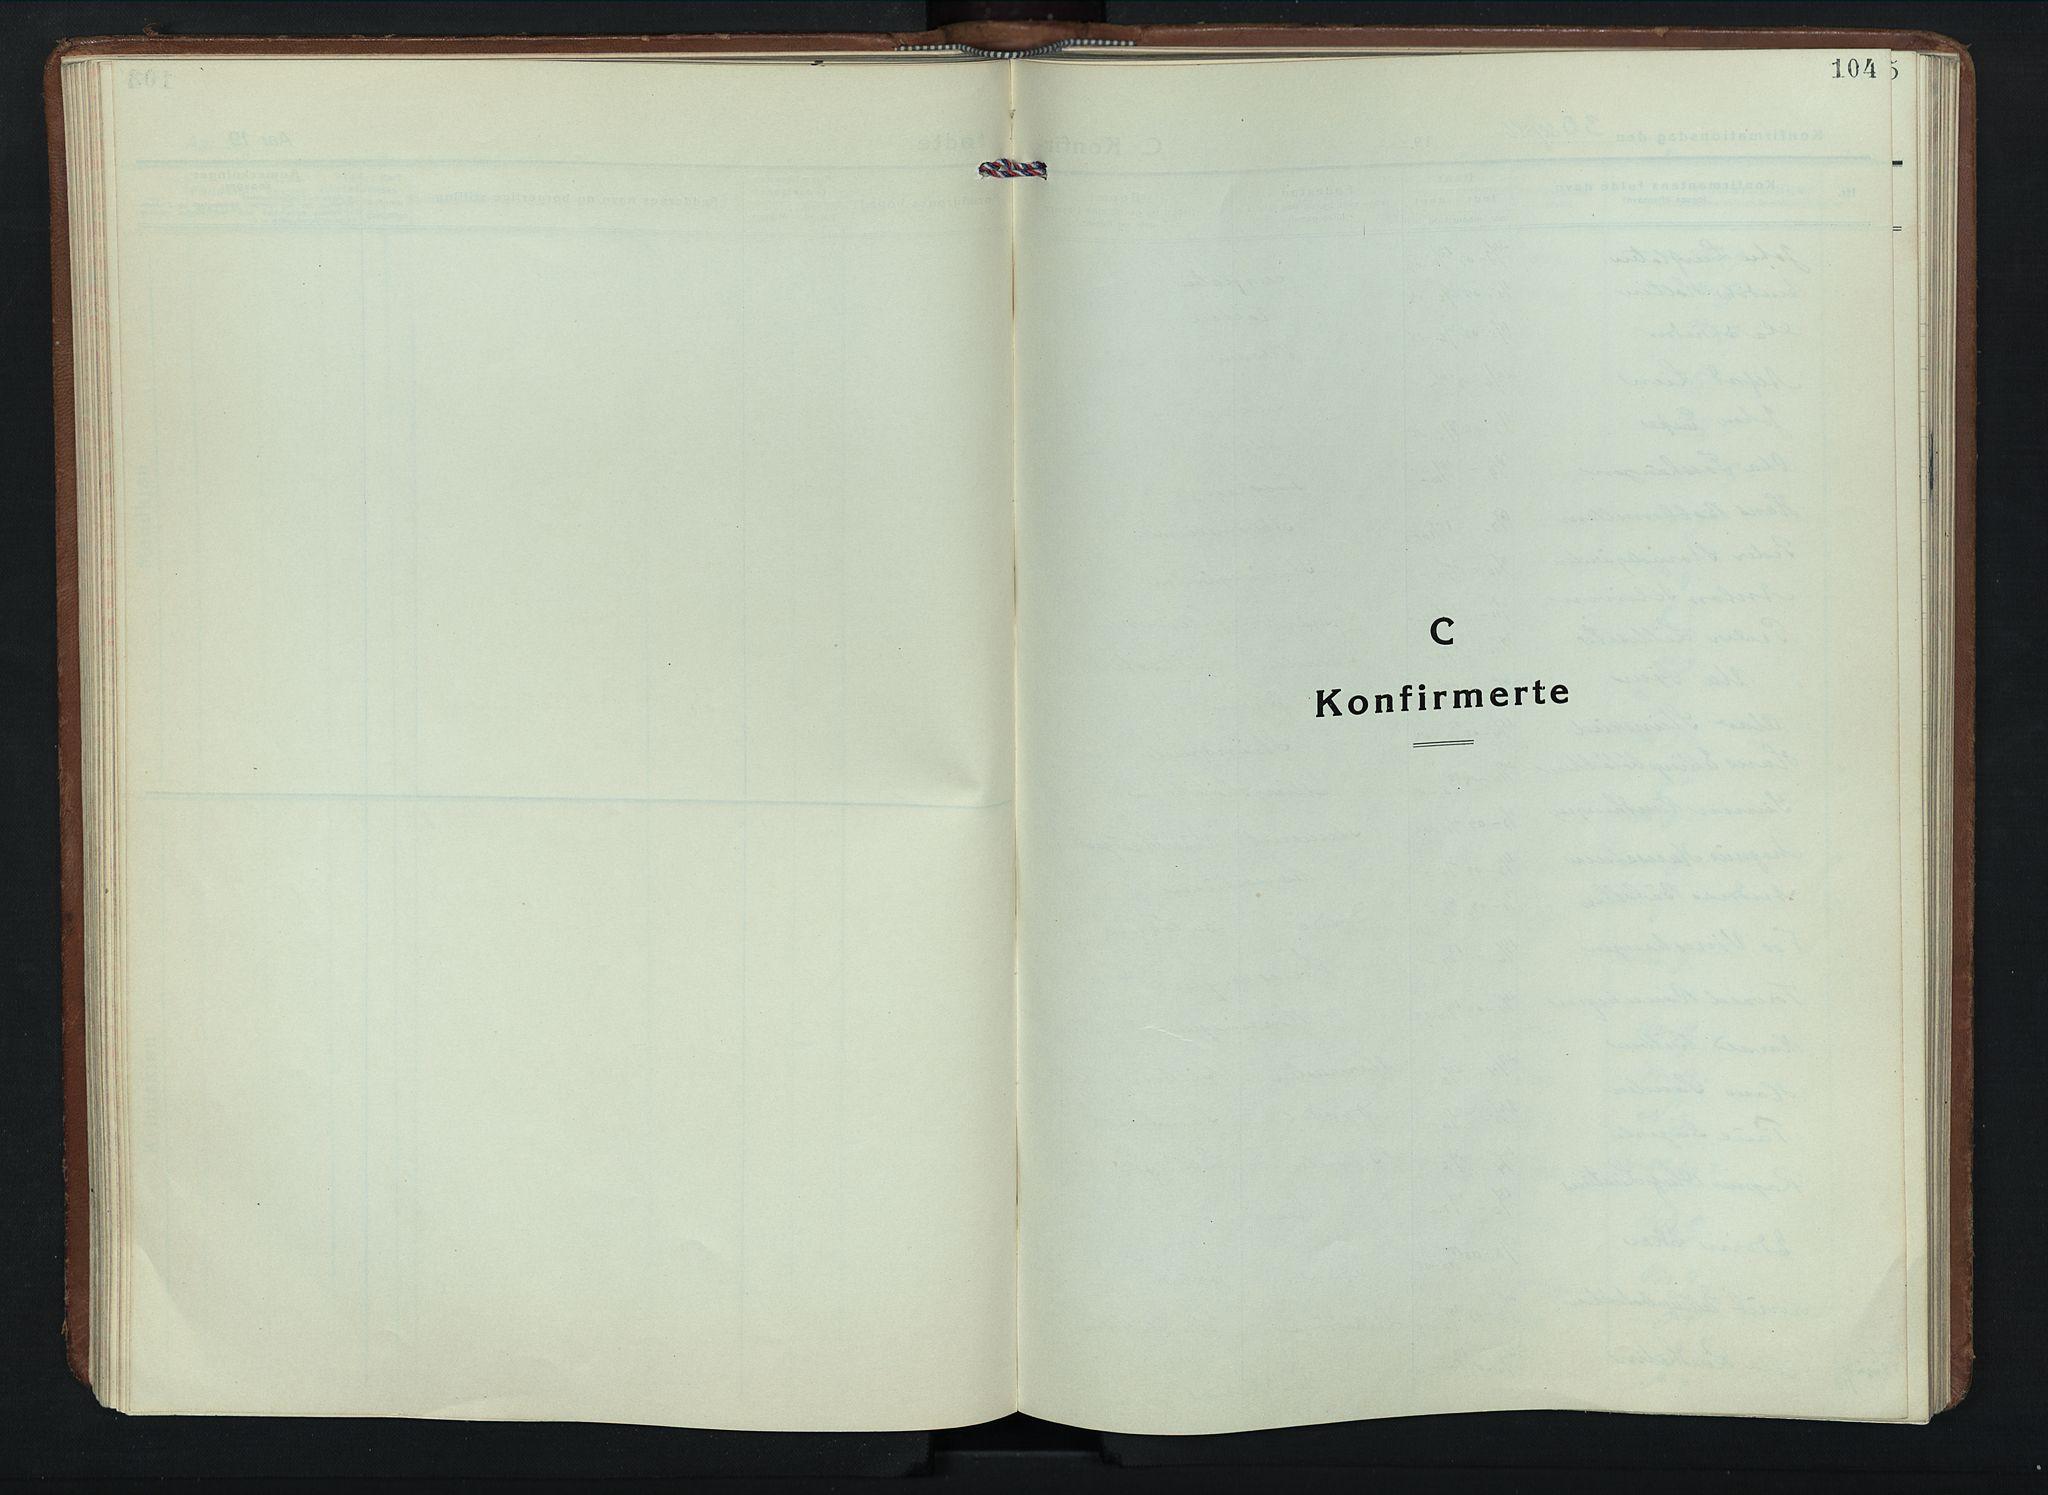 SAH, Sel prestekontor, Klokkerbok nr. 6, 1923-1953, s. 104